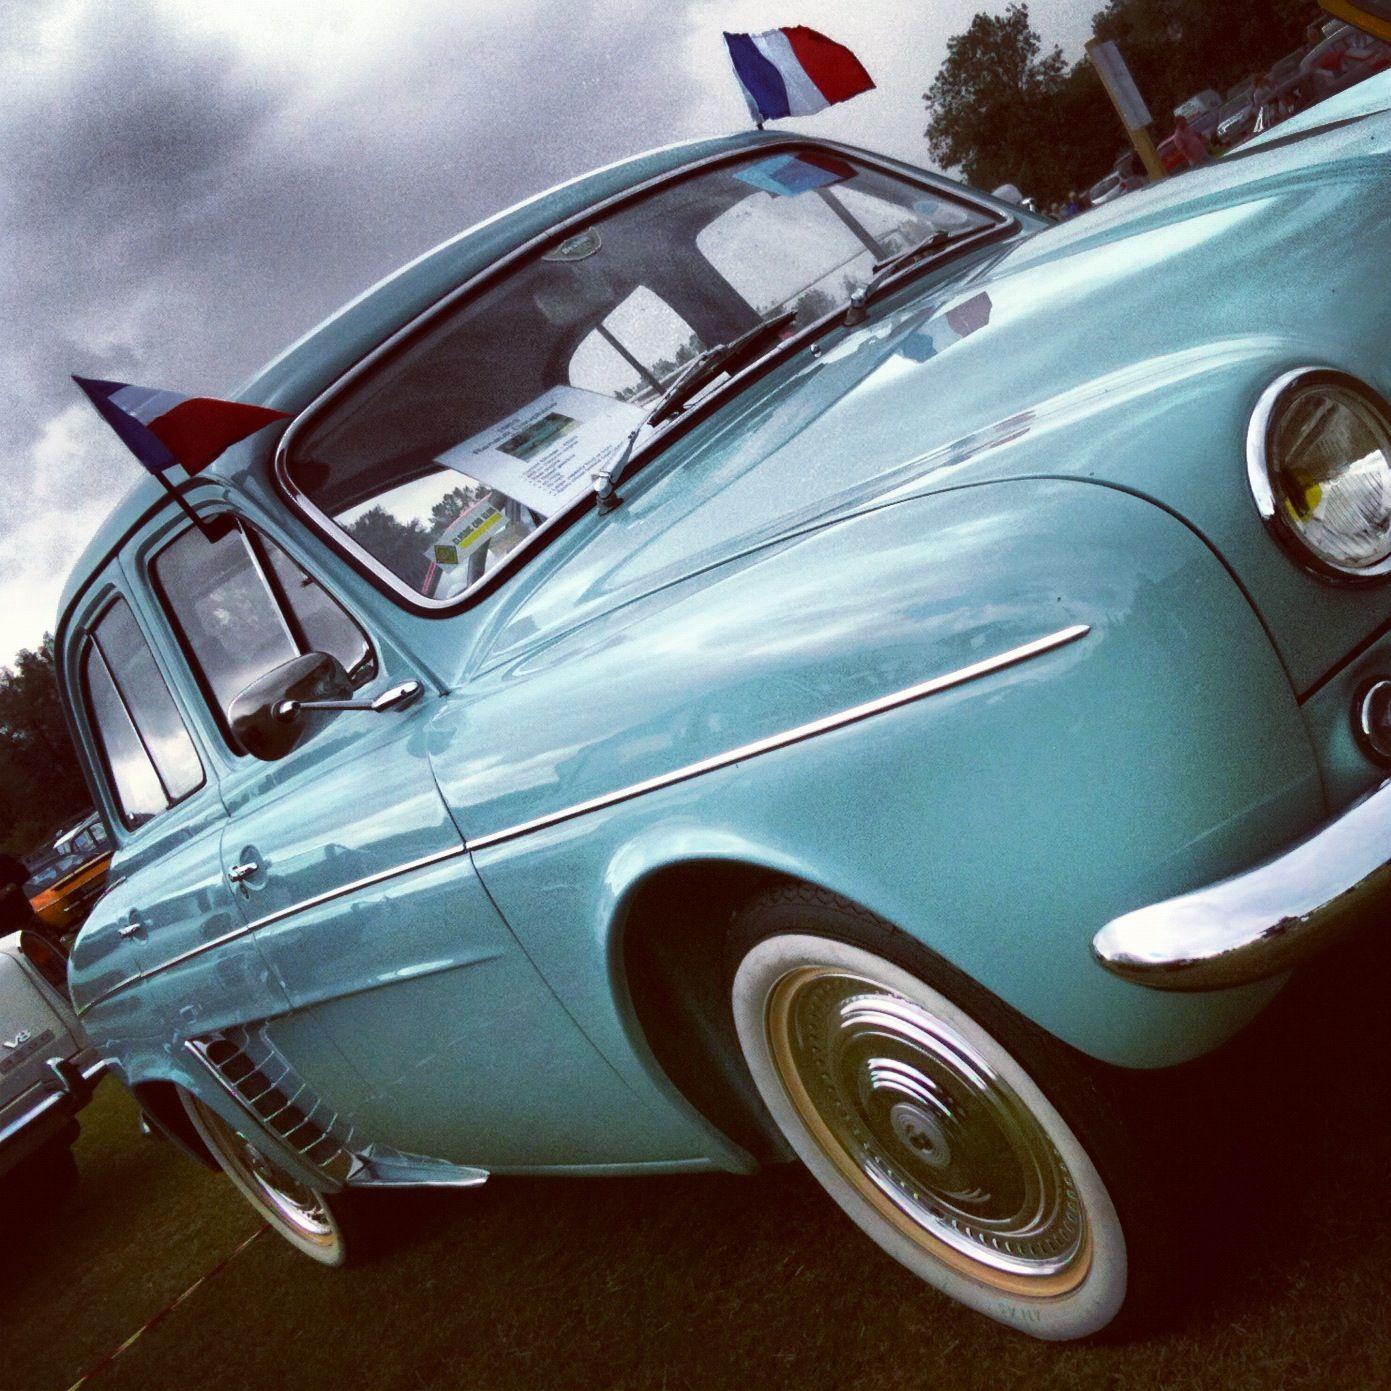 Renault Car Wallpaper: Superb Vintage #Renault #Dauphine - Love It!